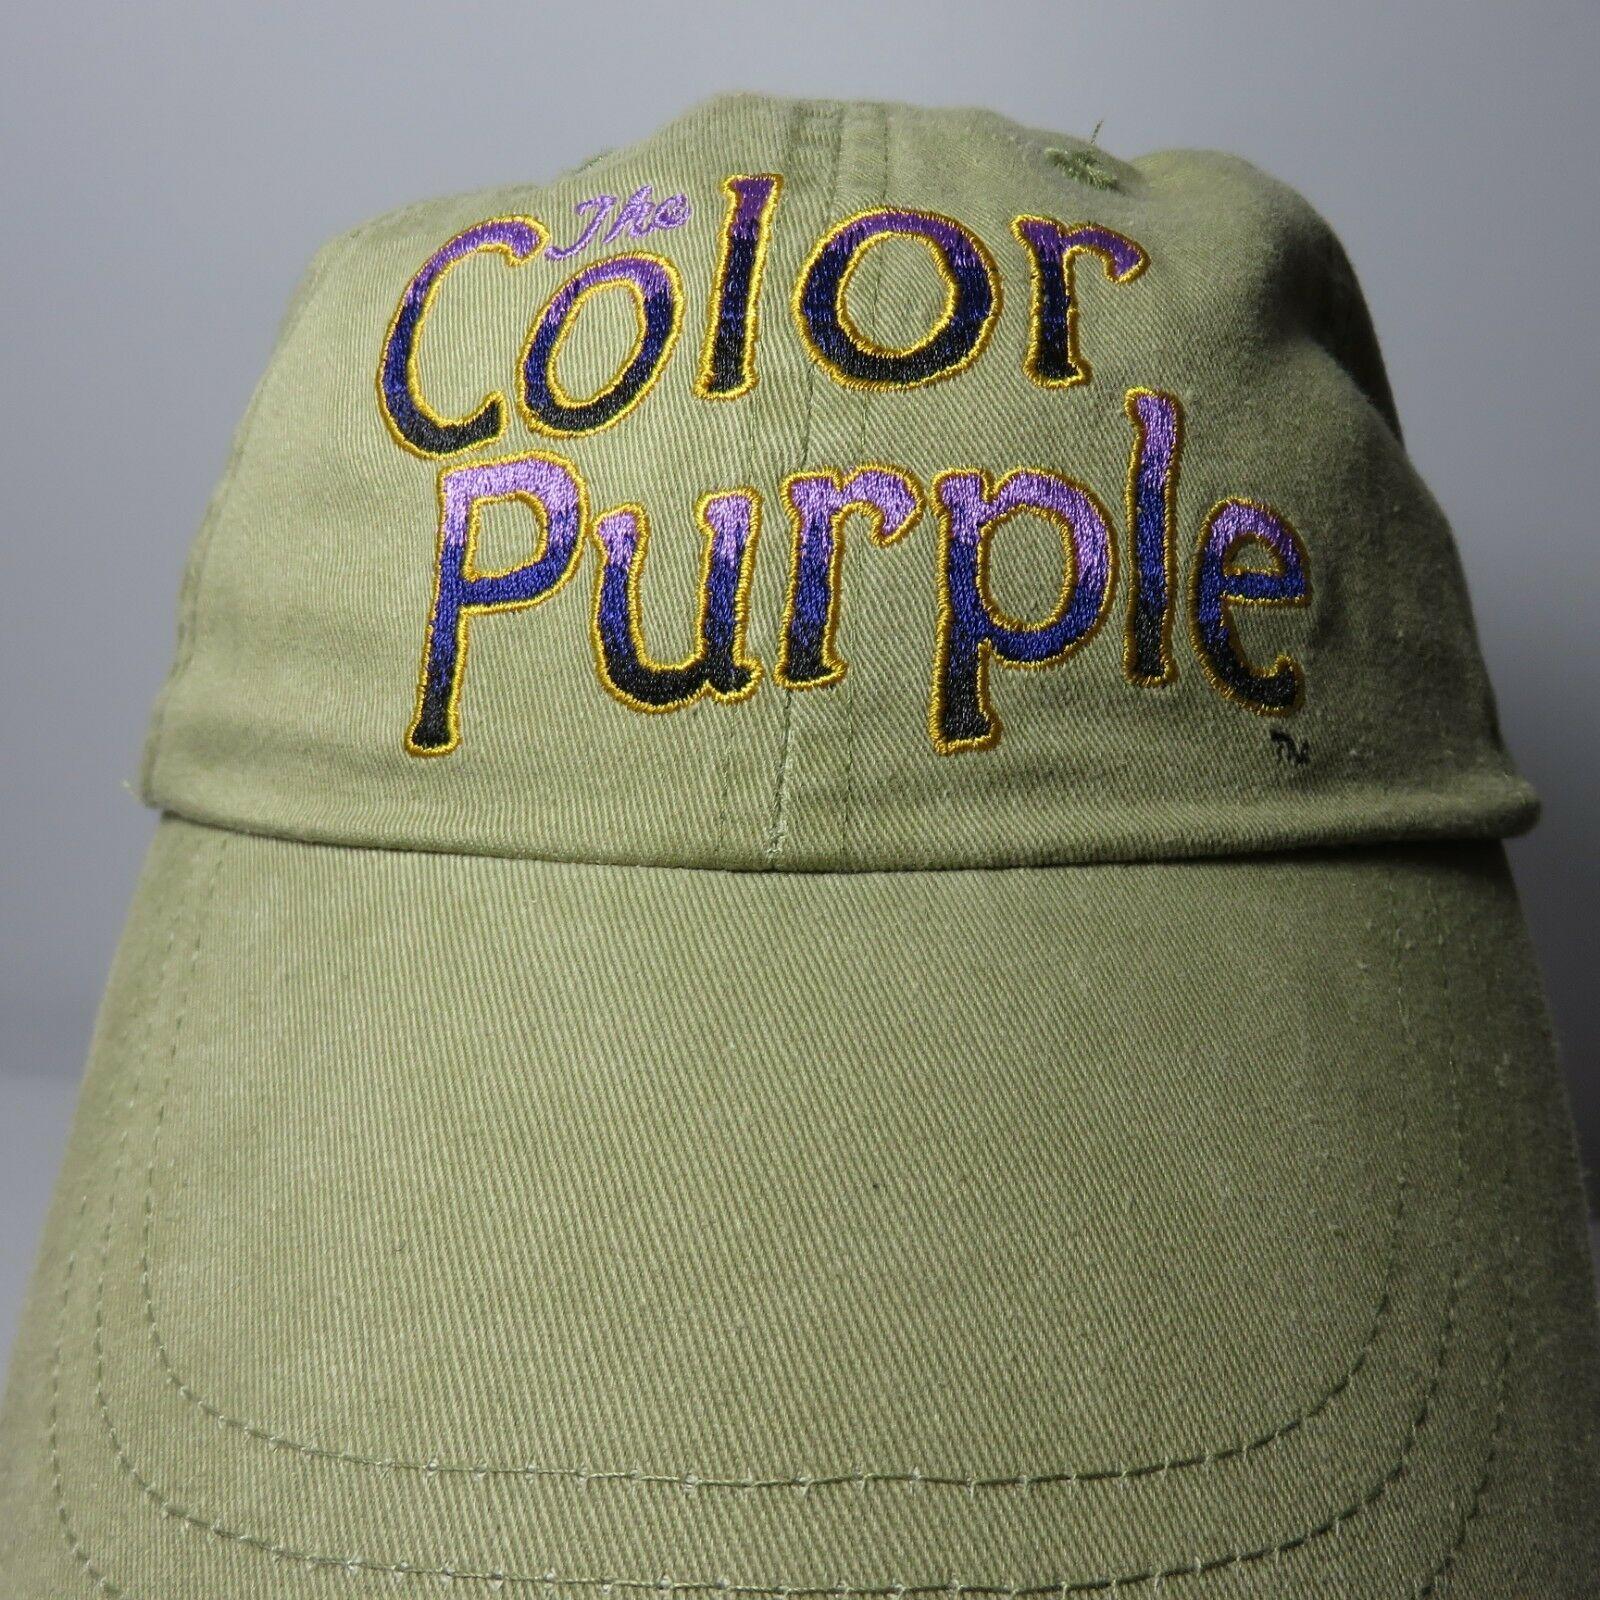 New The Color Purple Original 2005 Broadway Show Cap Hat Oprah